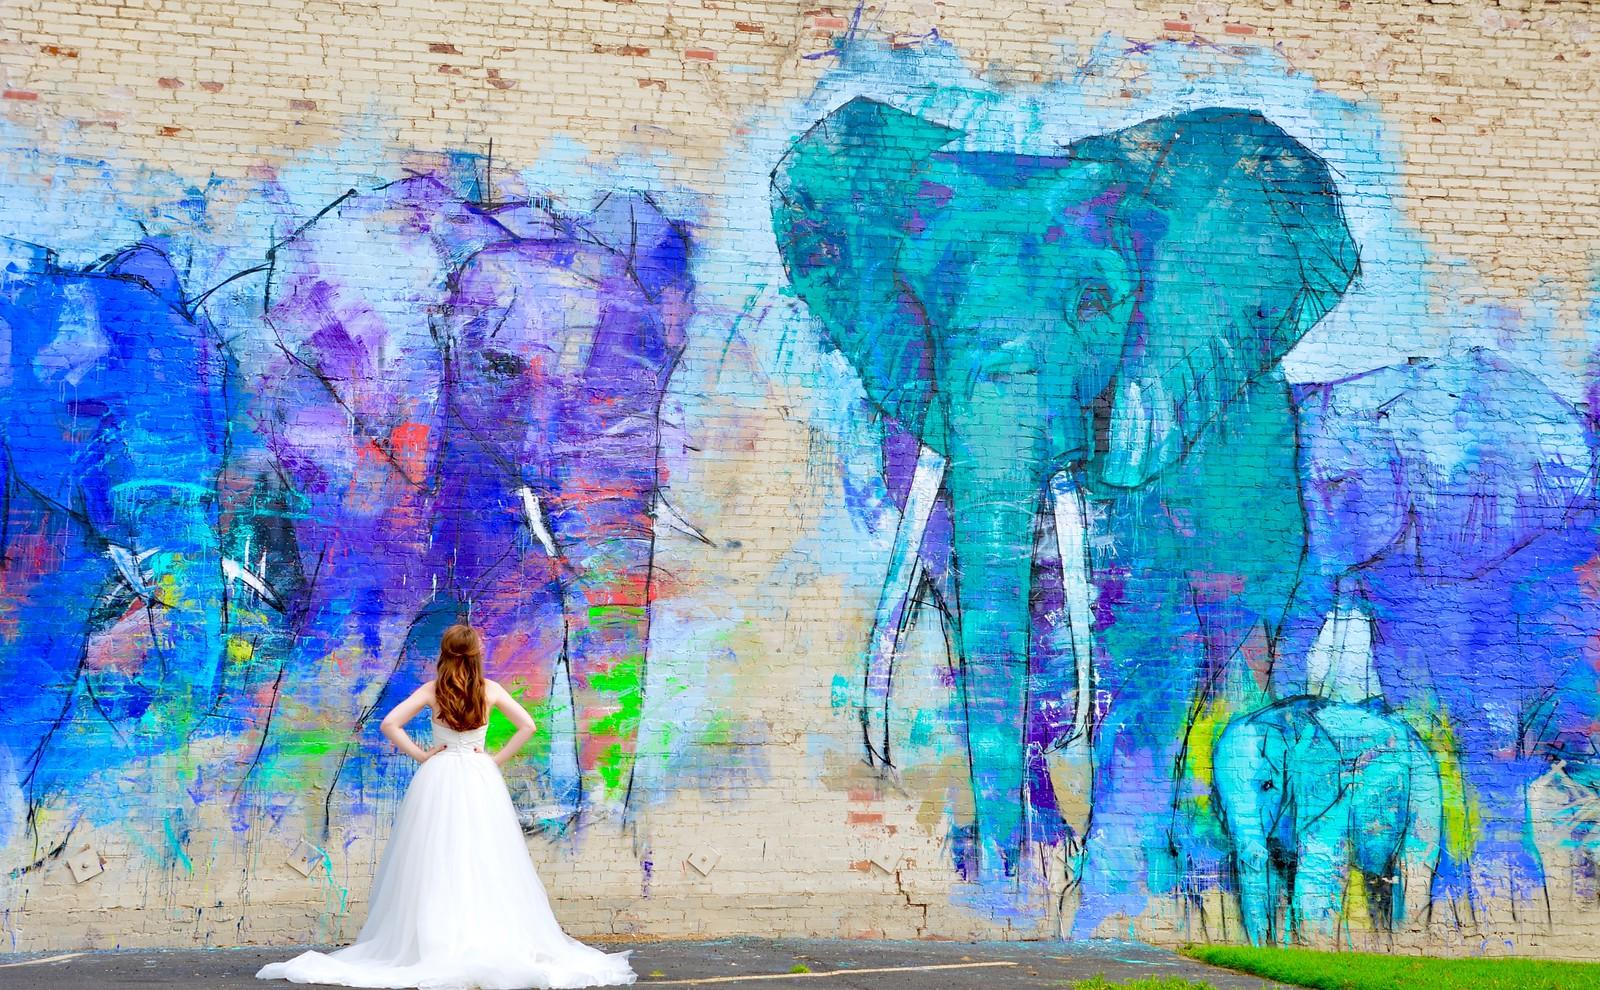 how i found my wedding dress, plus 9 tips to find yours, wedding dress tips, wedding dress shopping, deep ellum elephant mural, nordstrom bridal sale, dallas wedding, heidi lockhart somes photography, where to get wedding dresses in dallas